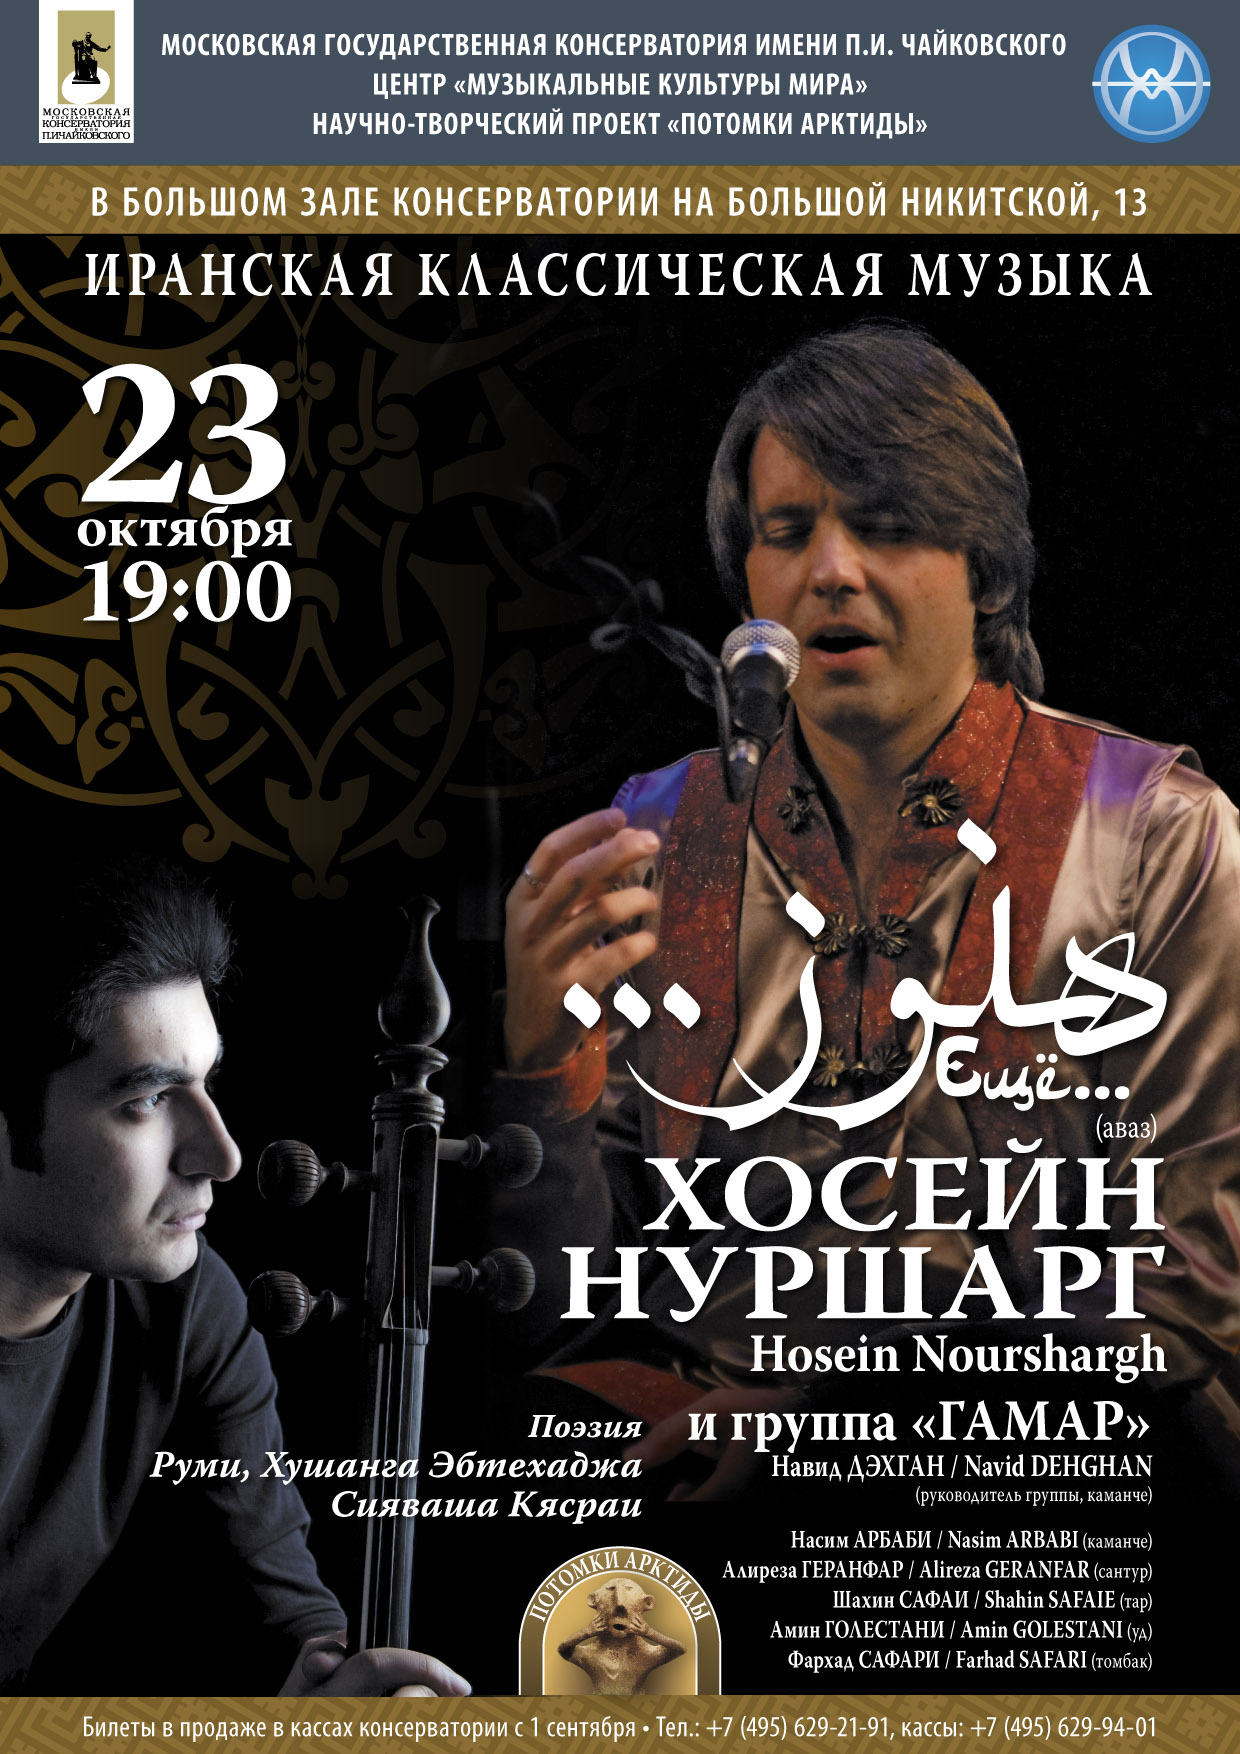 Афиша-23.10.2012_ред